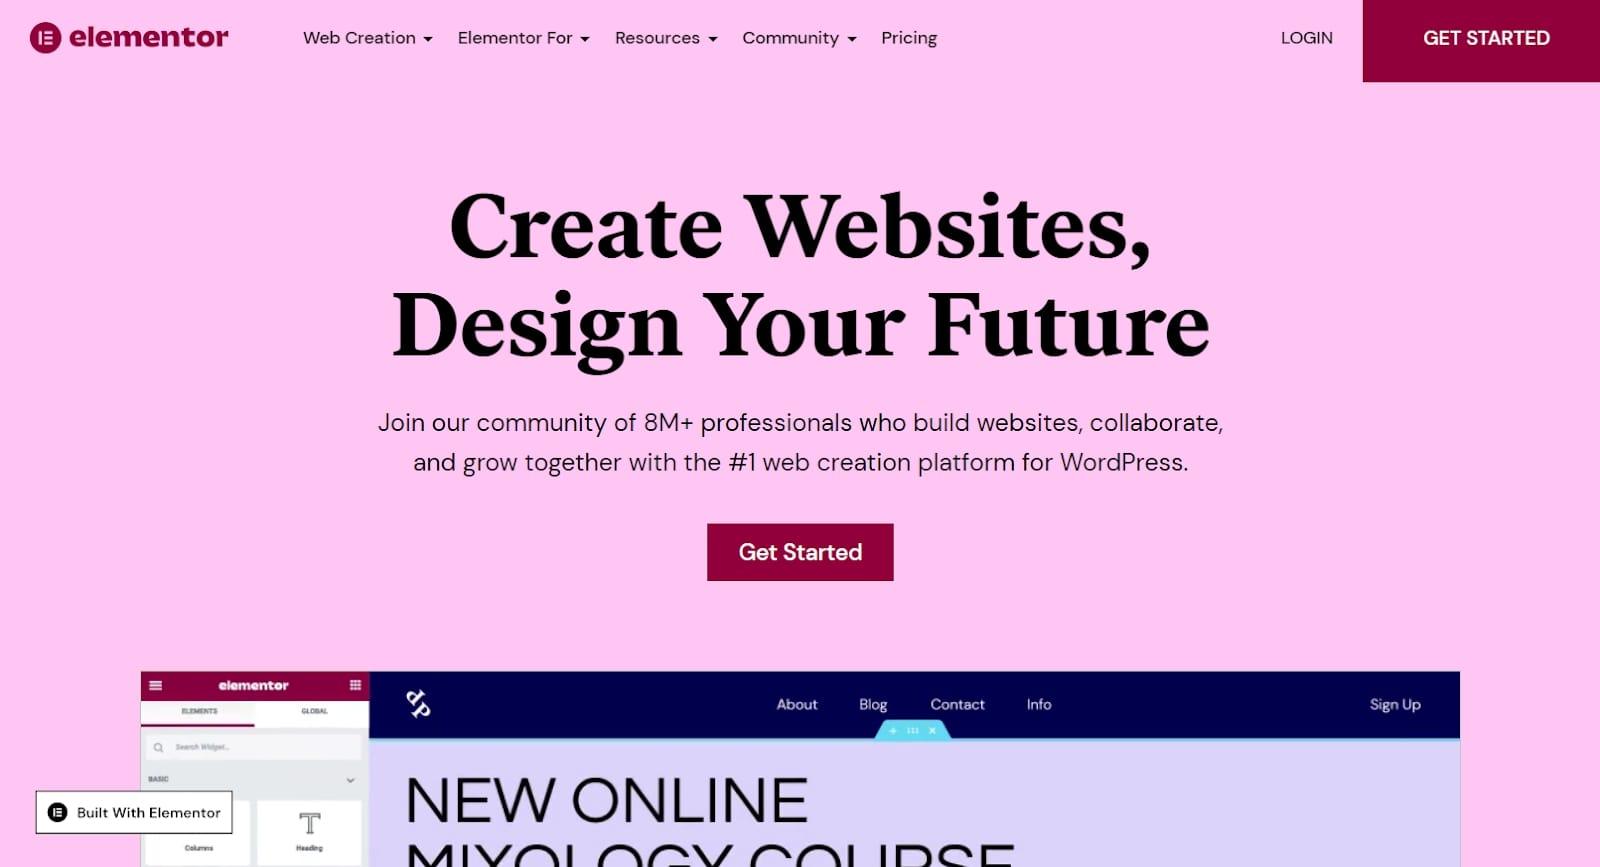 Elementor's homepage